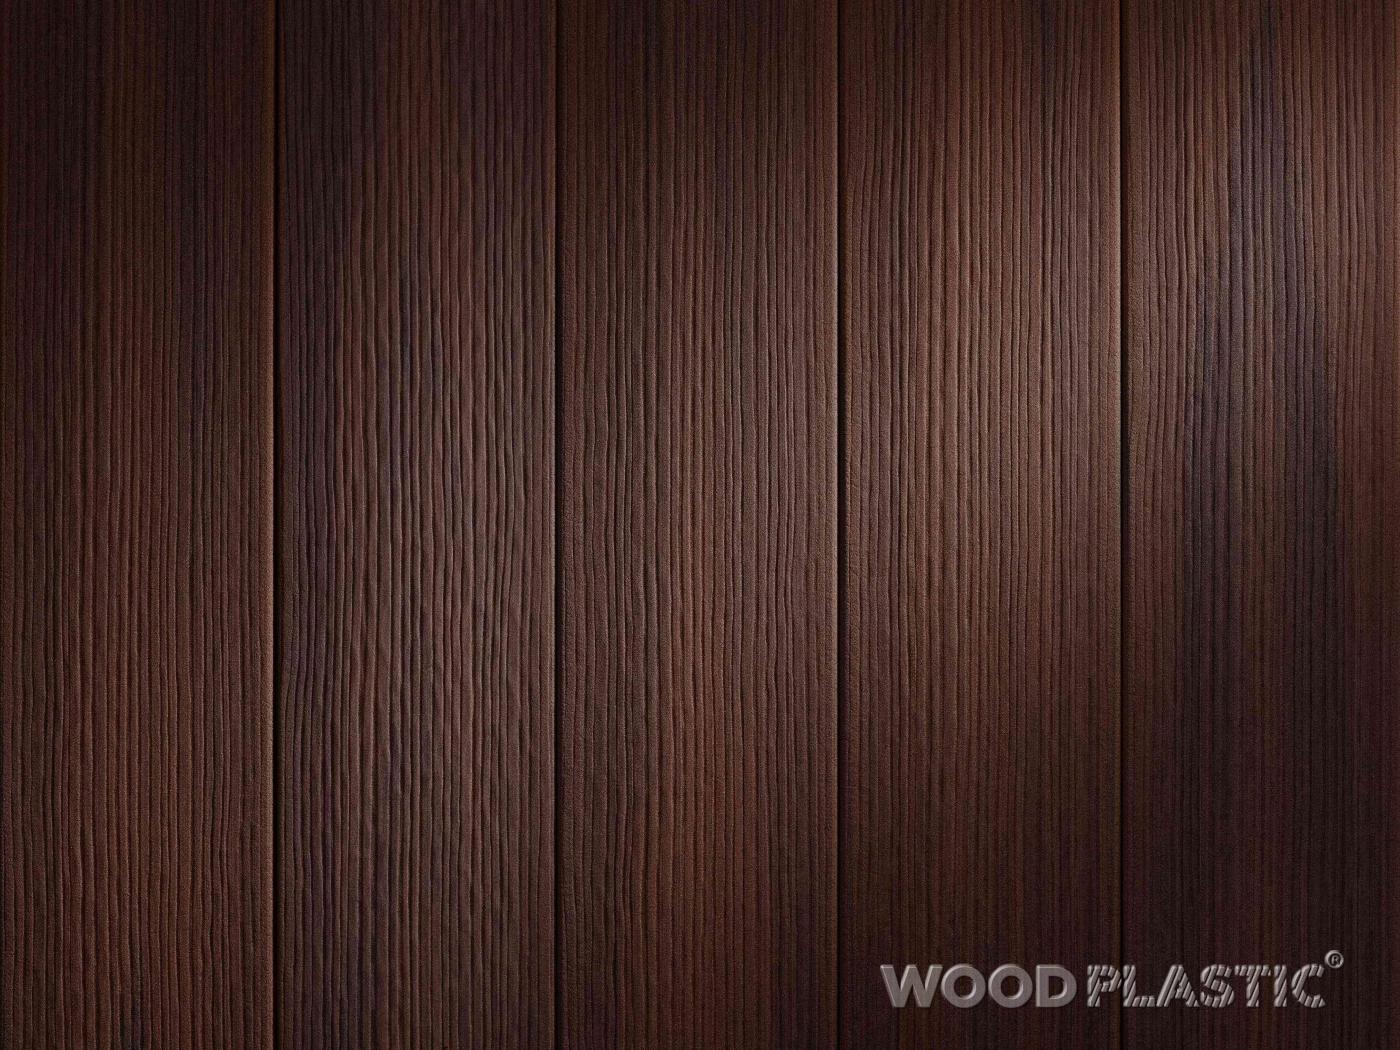 Realizácia - bezúdržbové terasové dosky Woodplastic - Forest Plus, Palisander - Obrázok č. 9